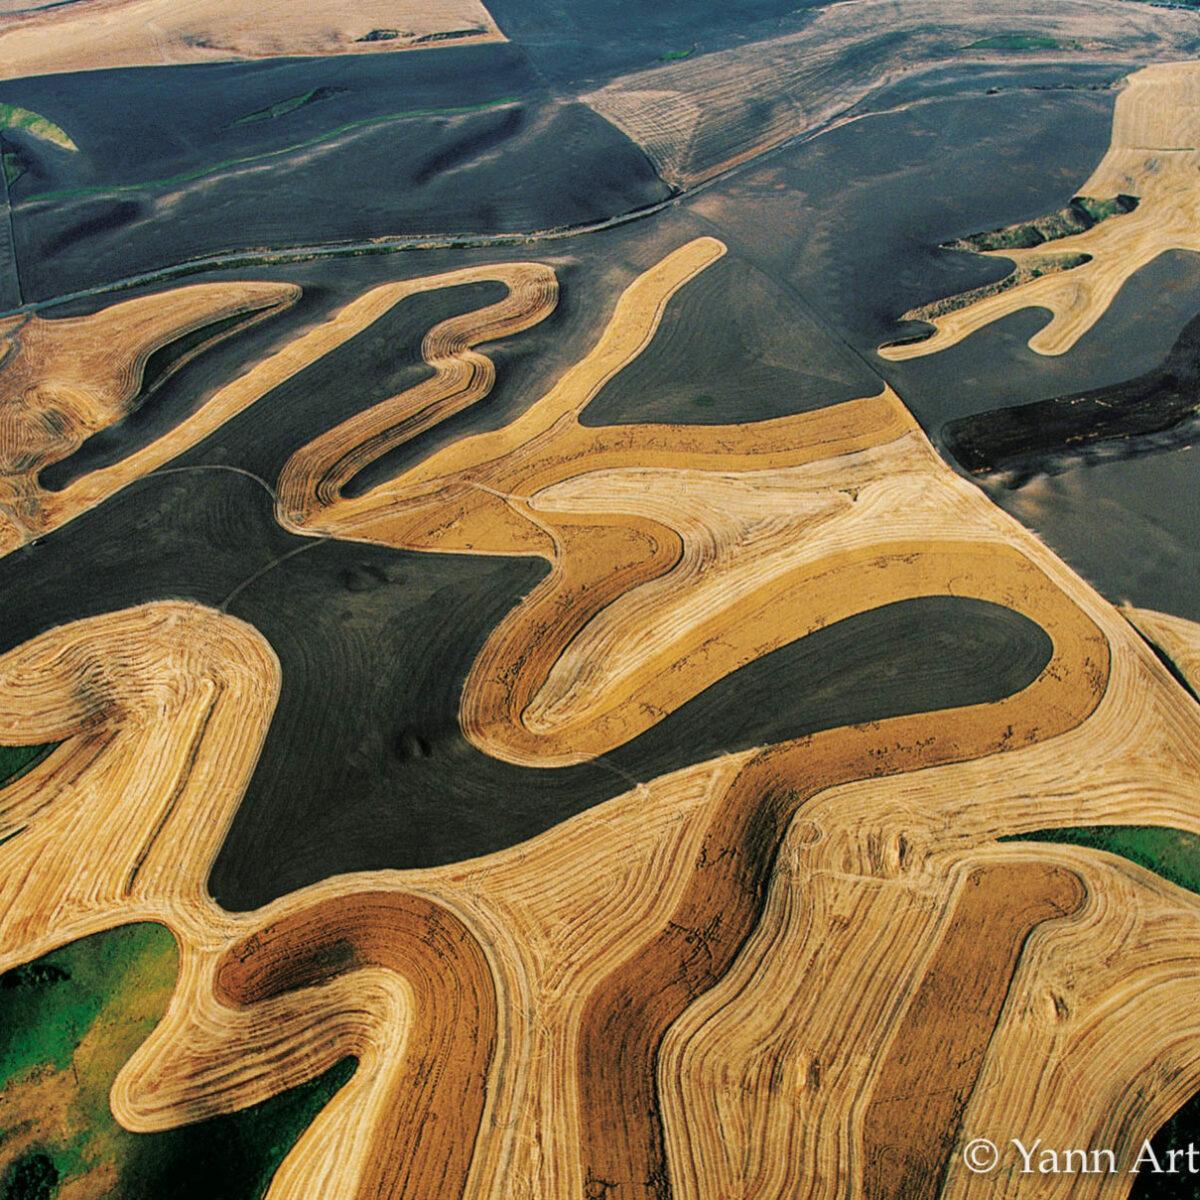 paysage agricole Etats-Unis